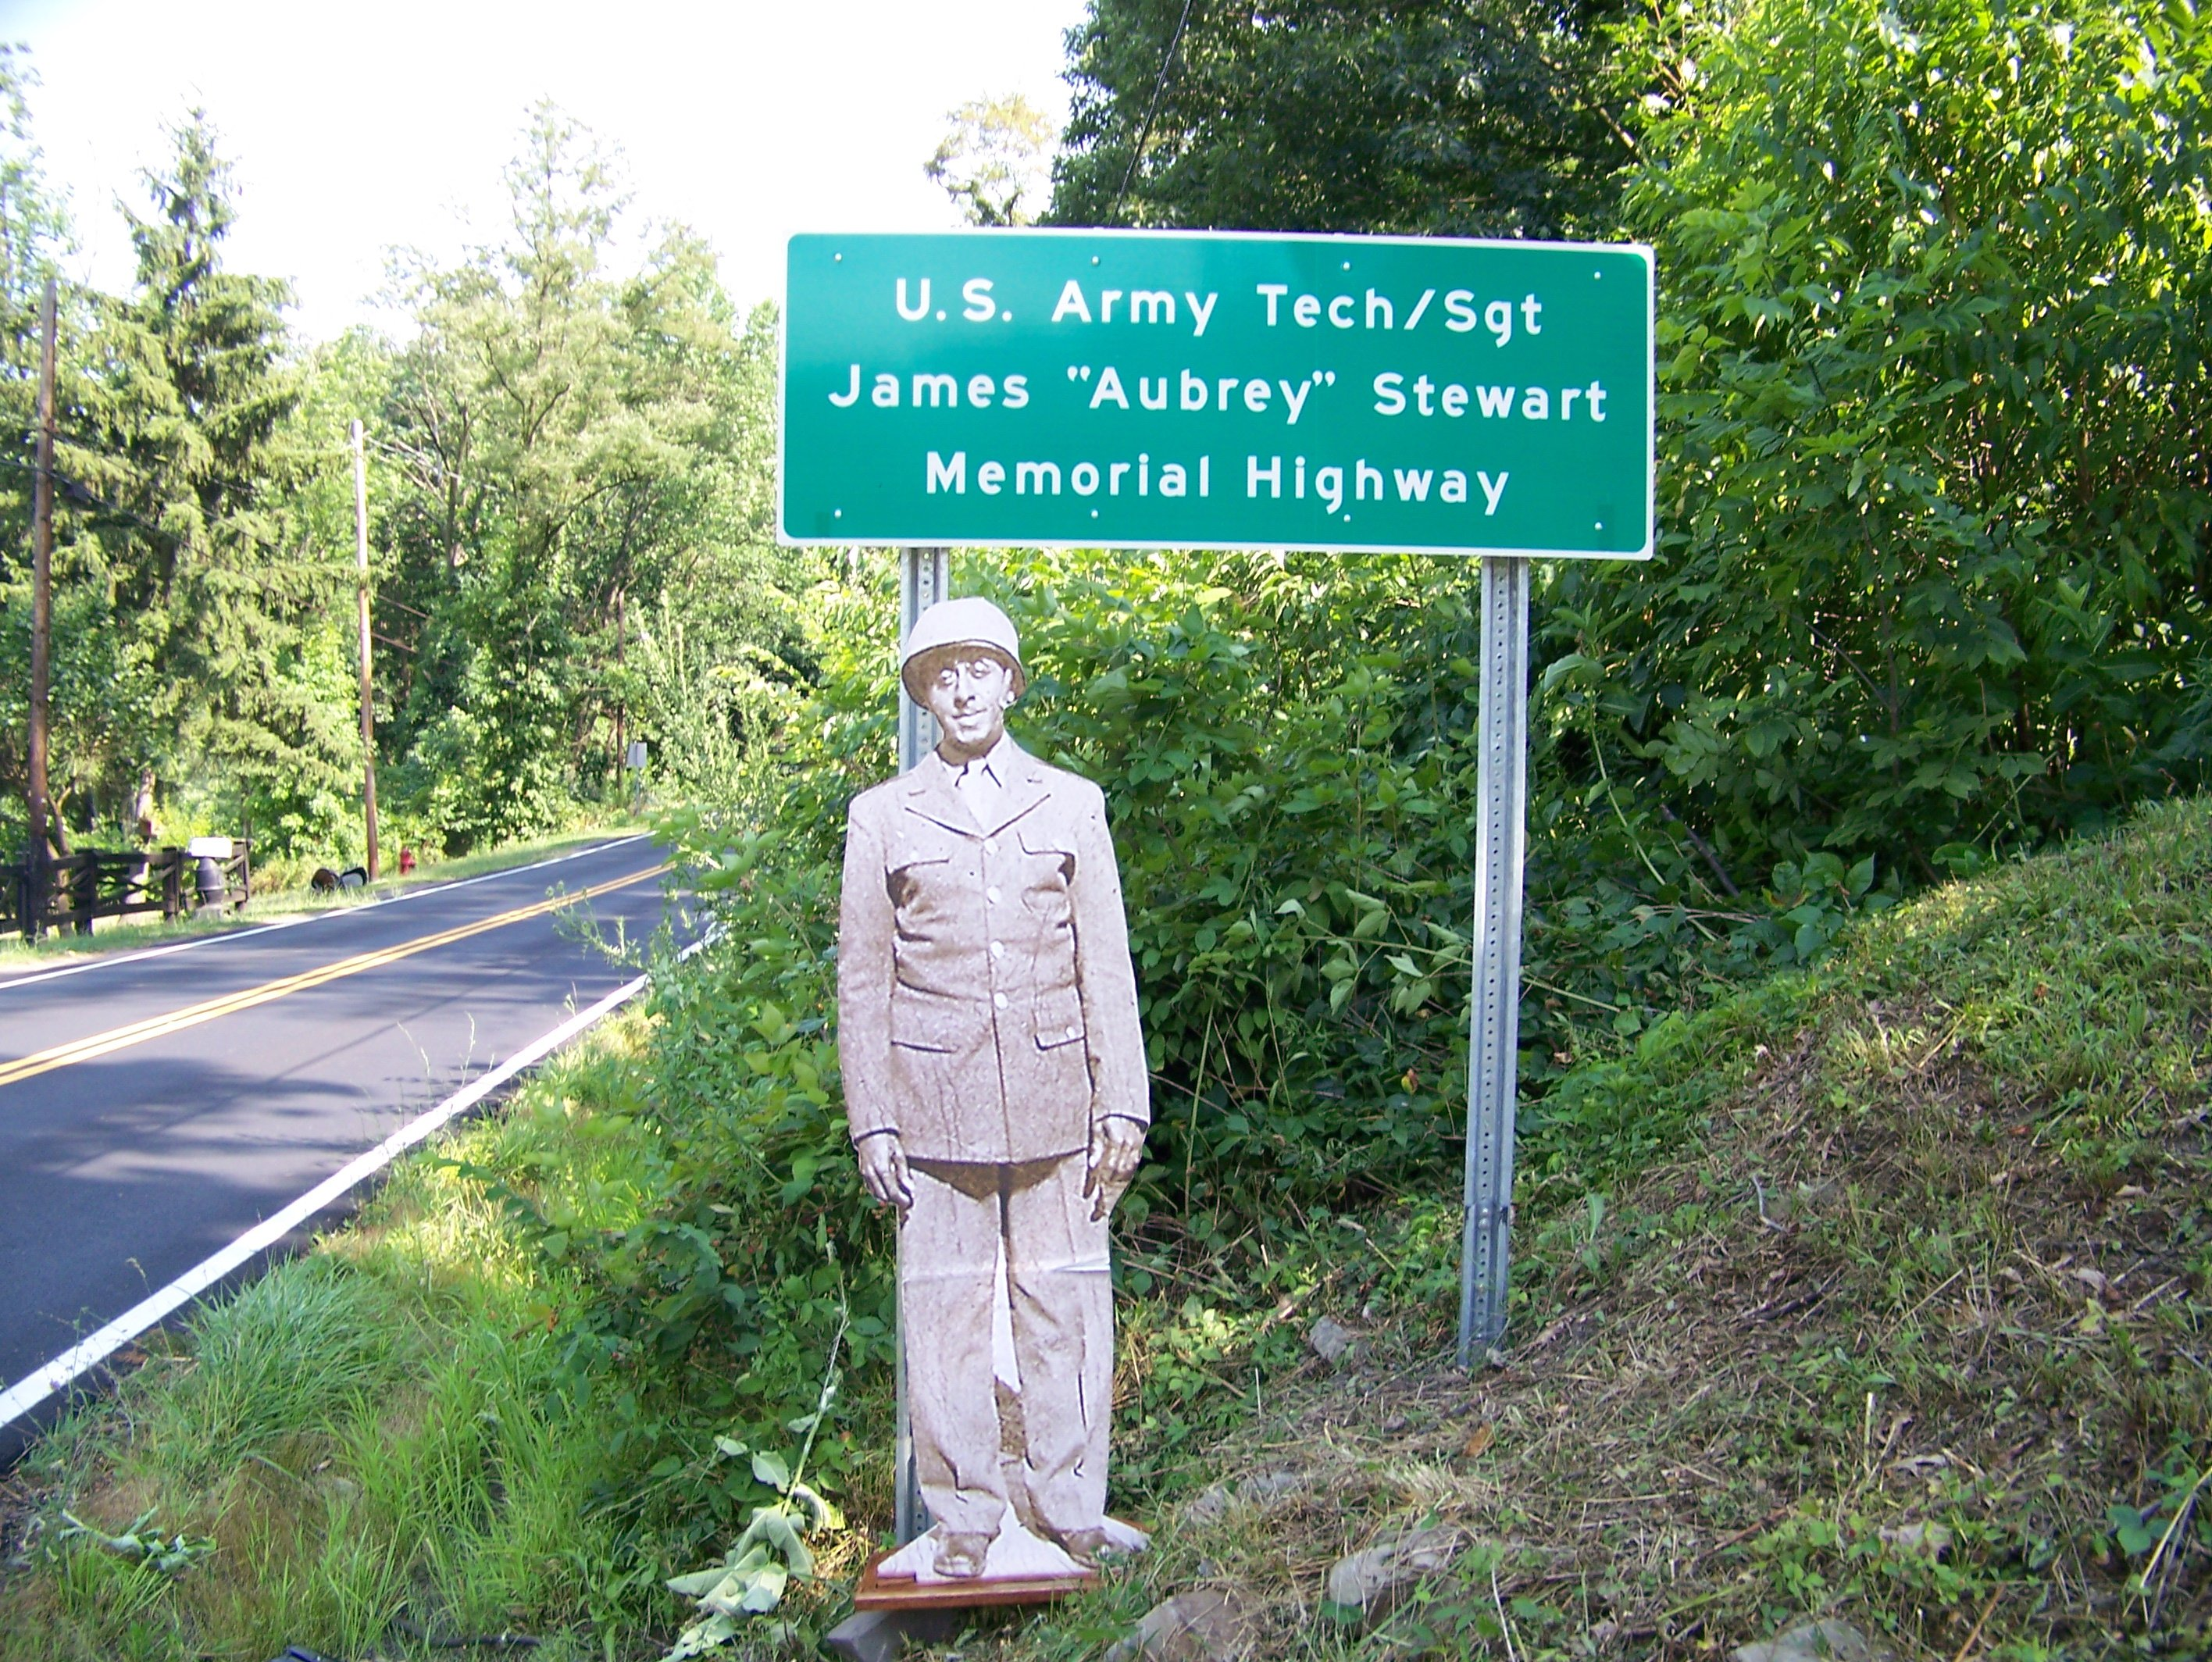 U.S. Army T/4 Sargent James Aubrey Stewart Memorial Highway U.S route 46 East in Piedmont, WV